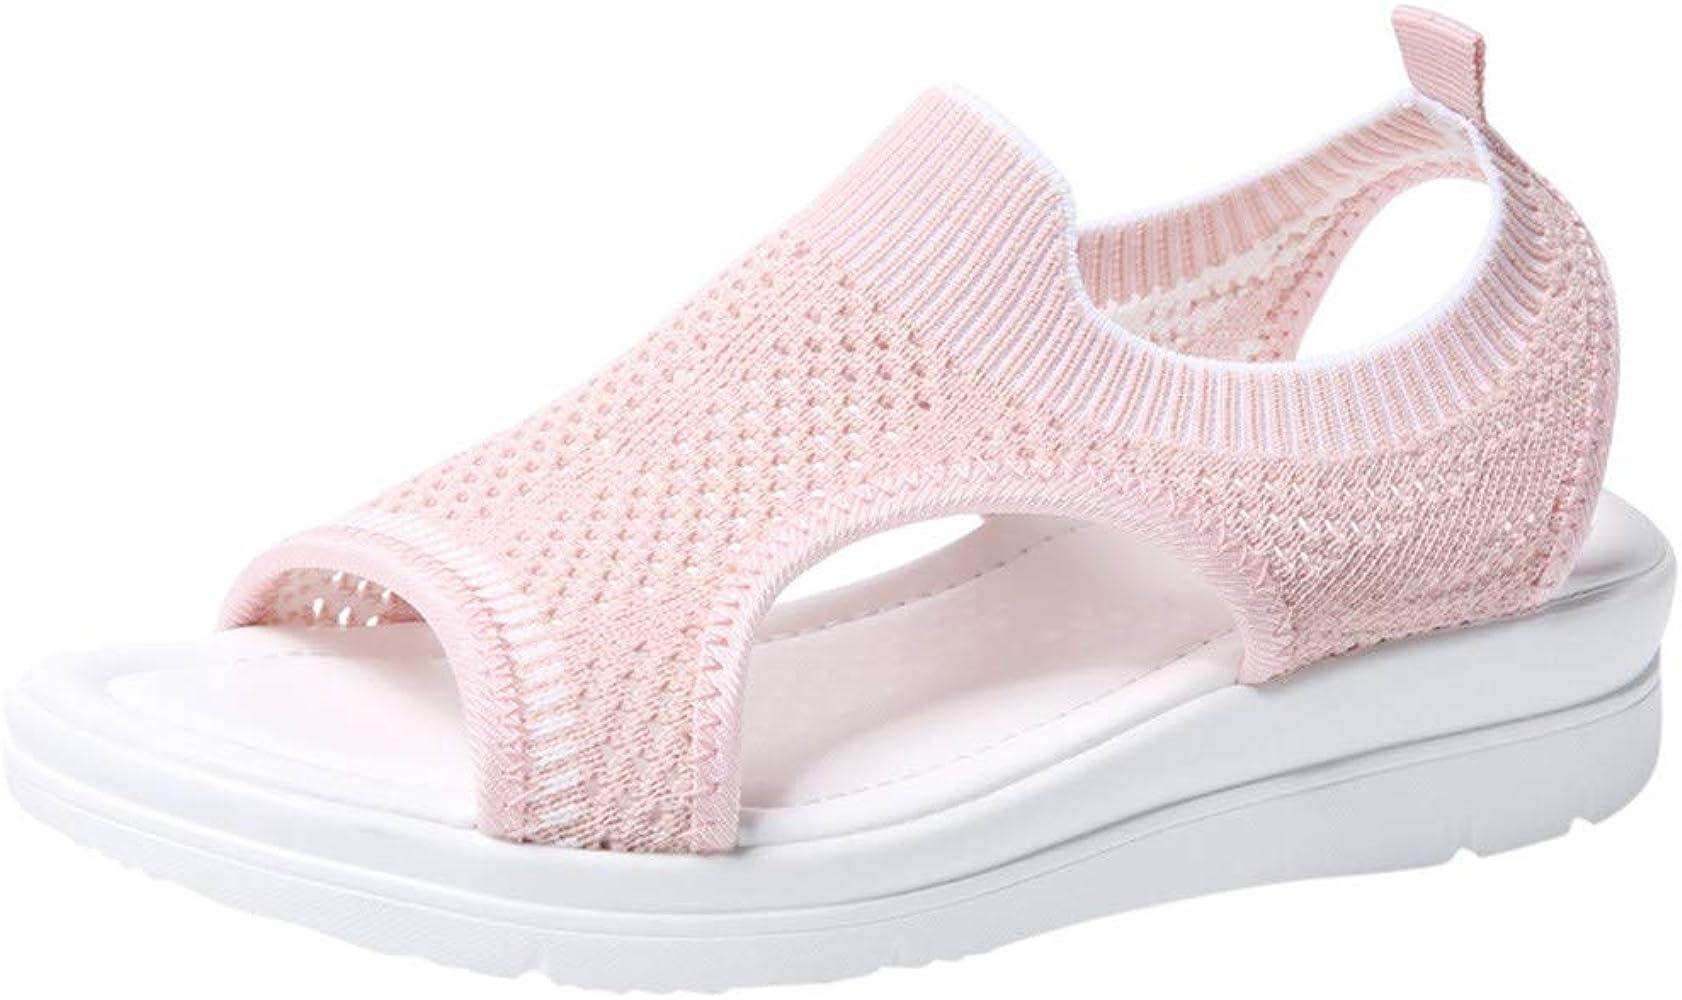 Women/'s Platform Thick Soft Sandals NDGDA Ladies Open Toe Summer Flip Flop Shoes Roman Casual Flock Sandals